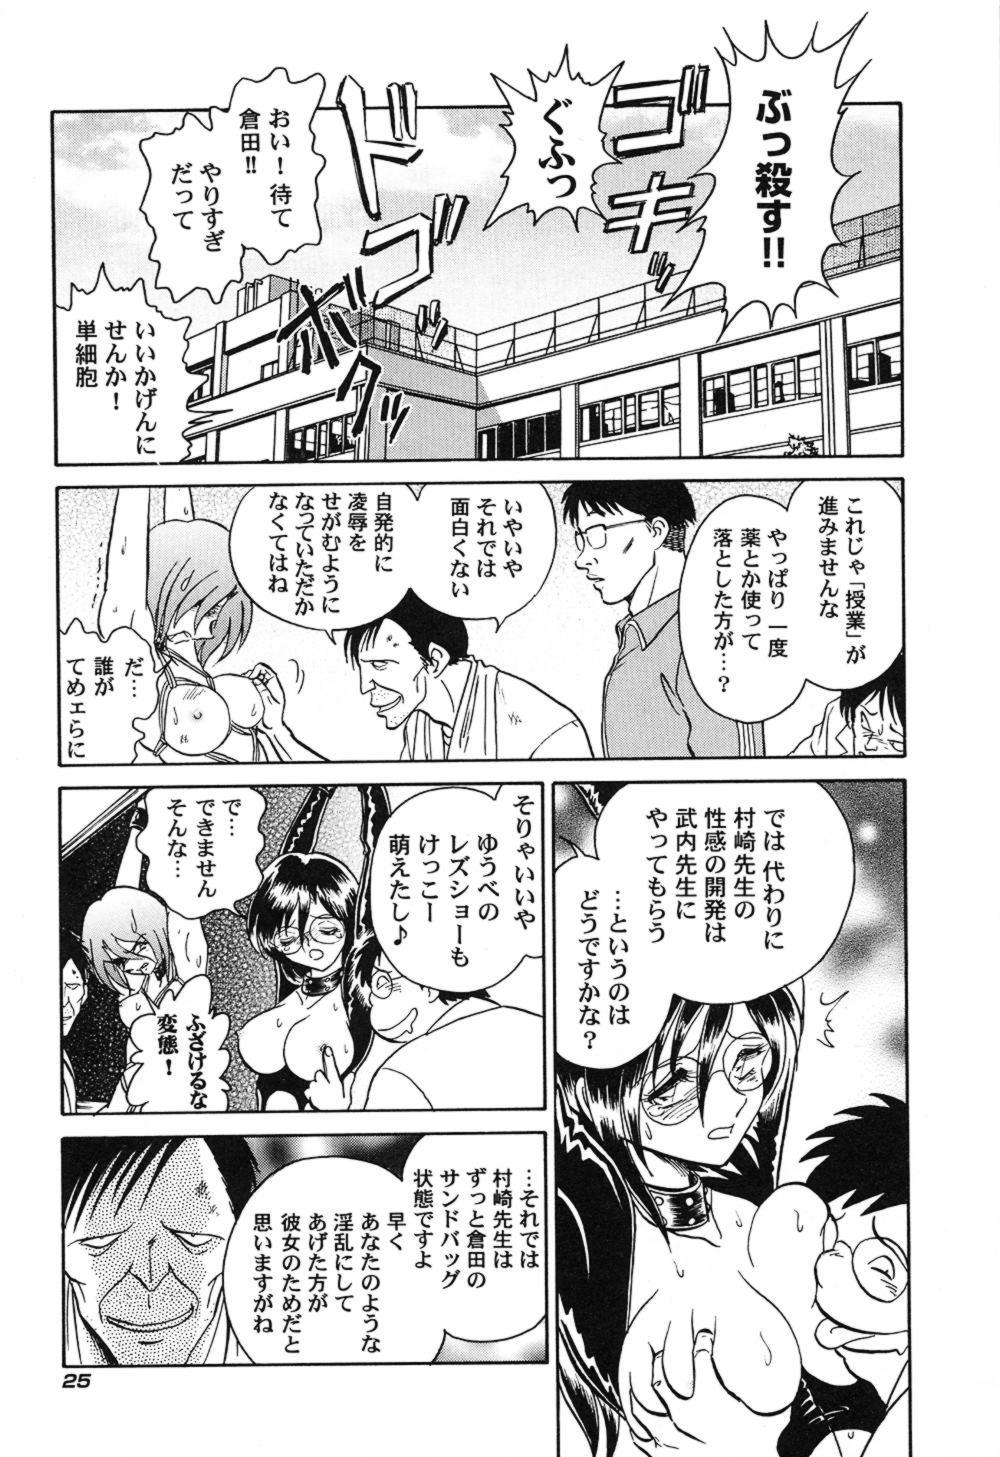 Hageshii Kagai Jugyou 27